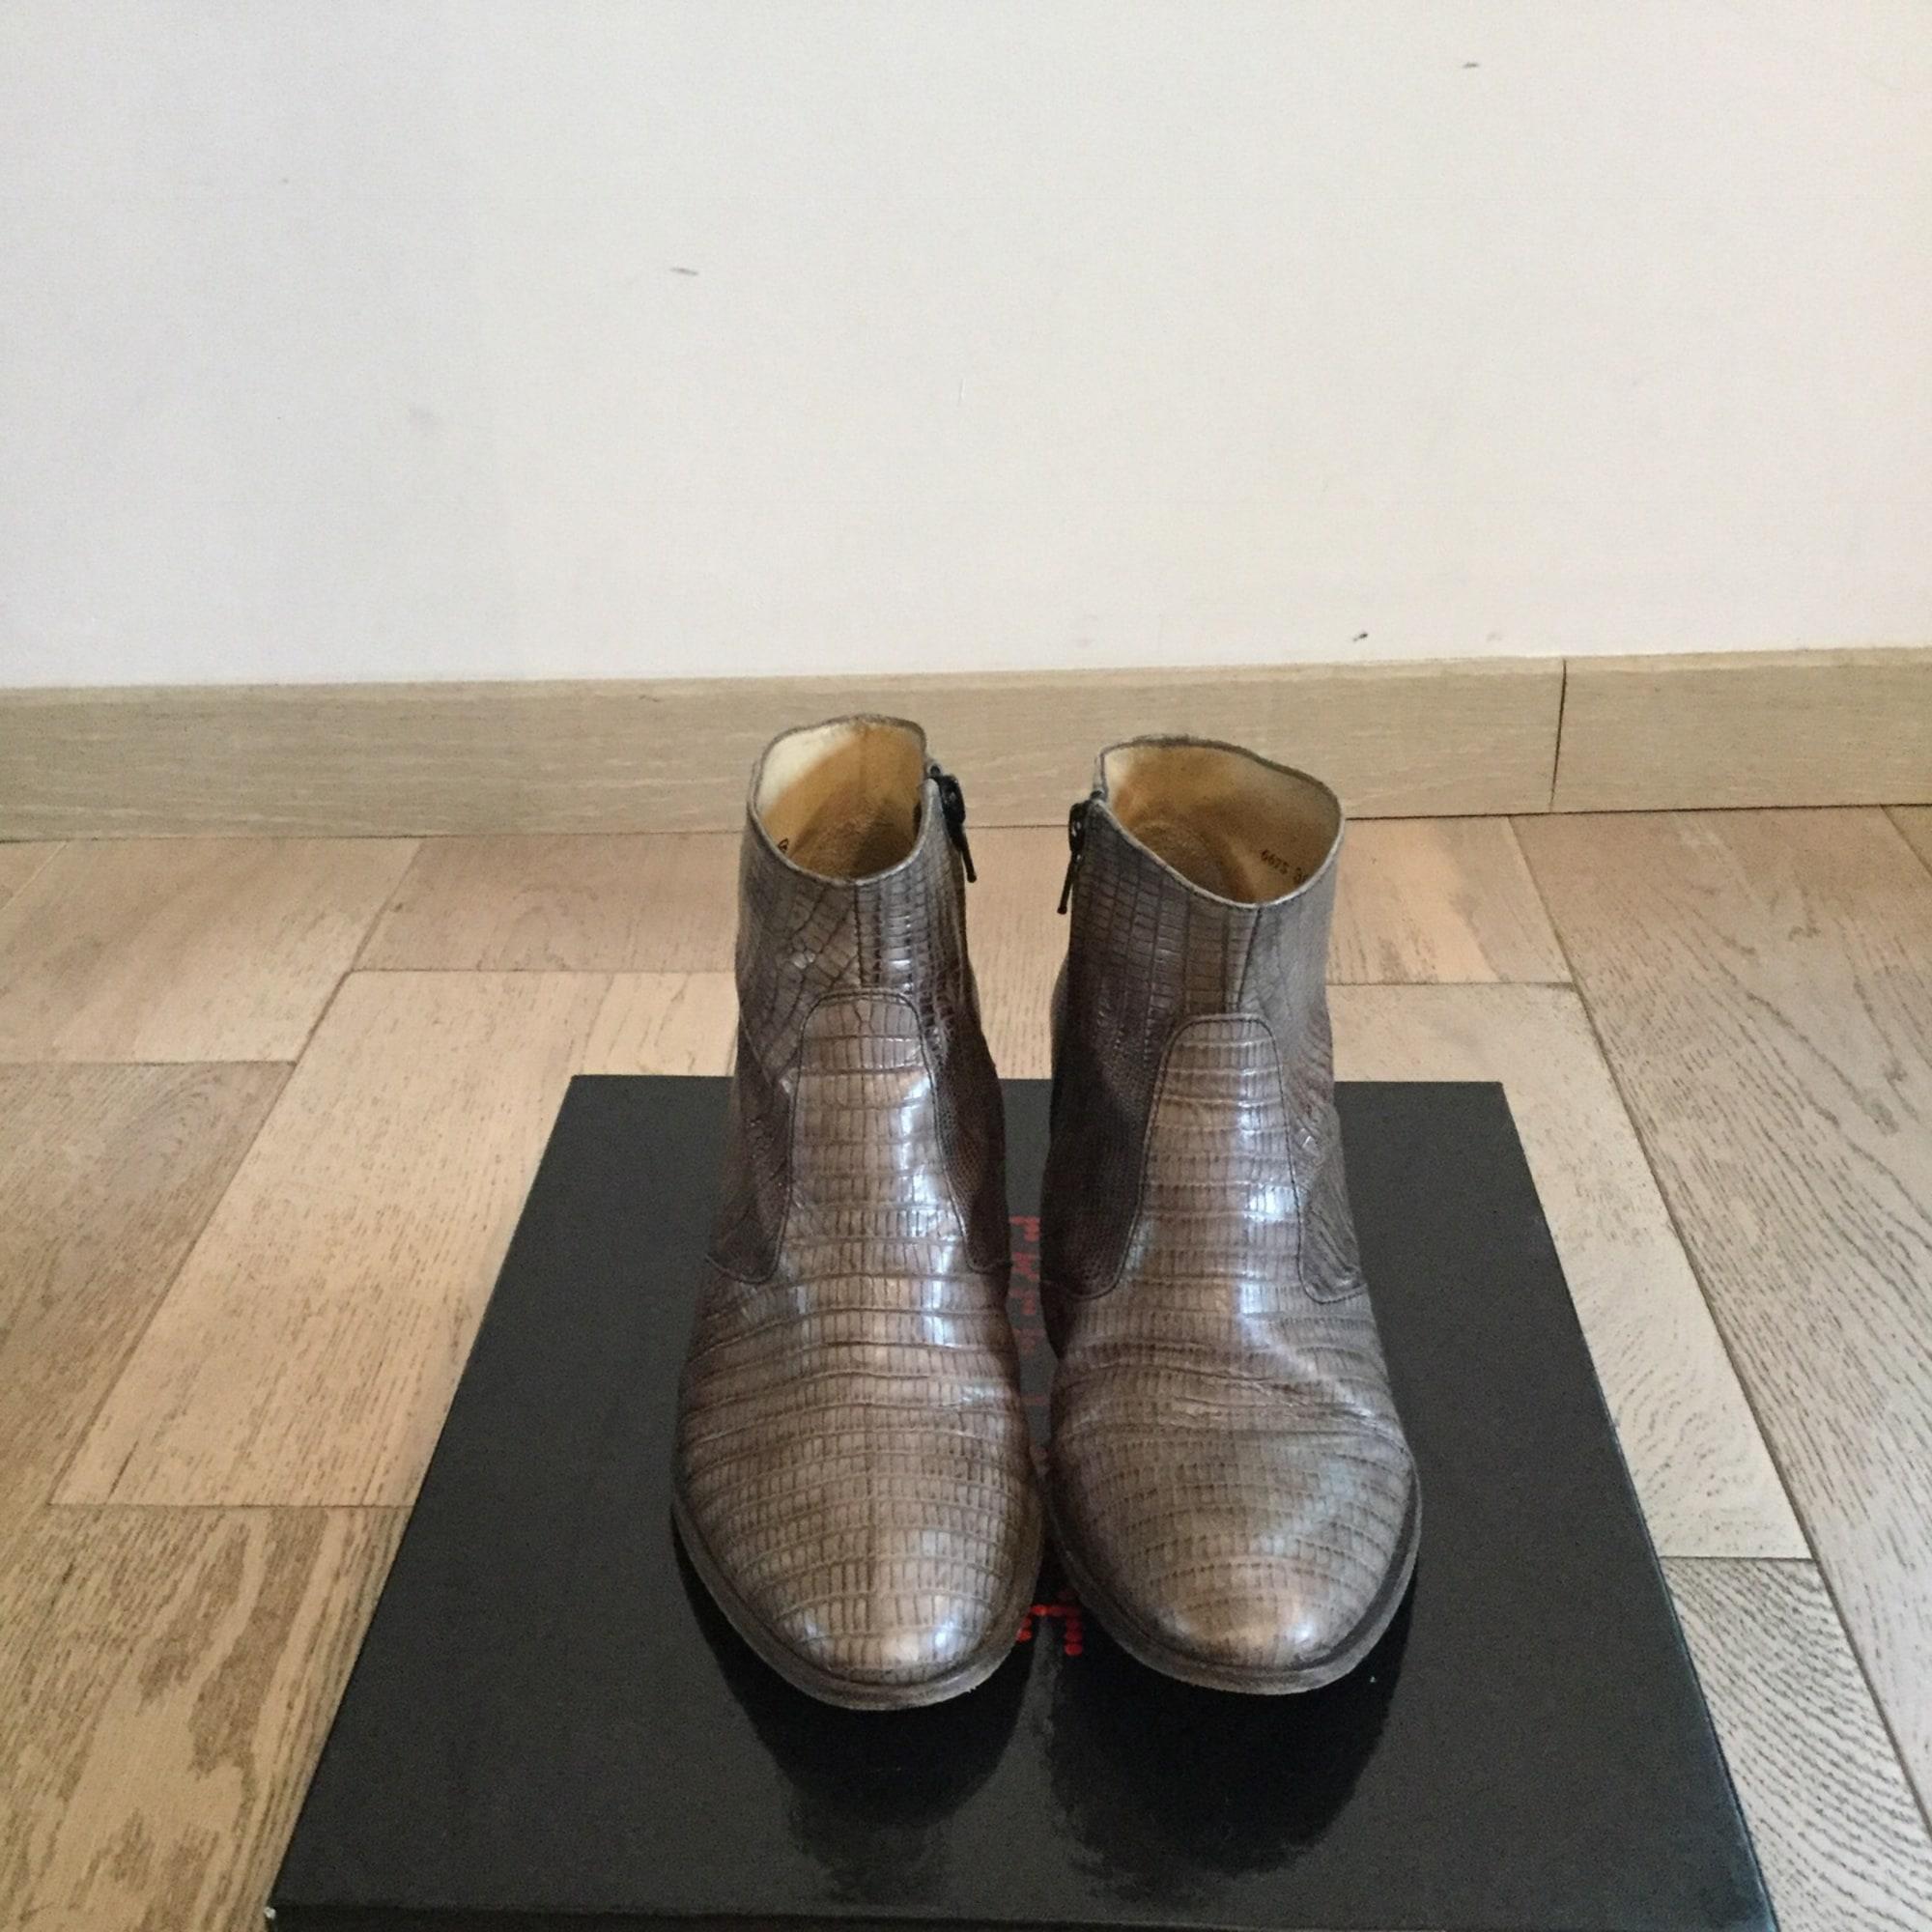 Boots Cowboy Boots SantiagsBottinesLow Cowboy Boots Boots SantiagsBottinesLow SantiagsBottinesLow SantiagsBottinesLow Boots SantiagsBottinesLow Cowboy Cowboy lK1JFc